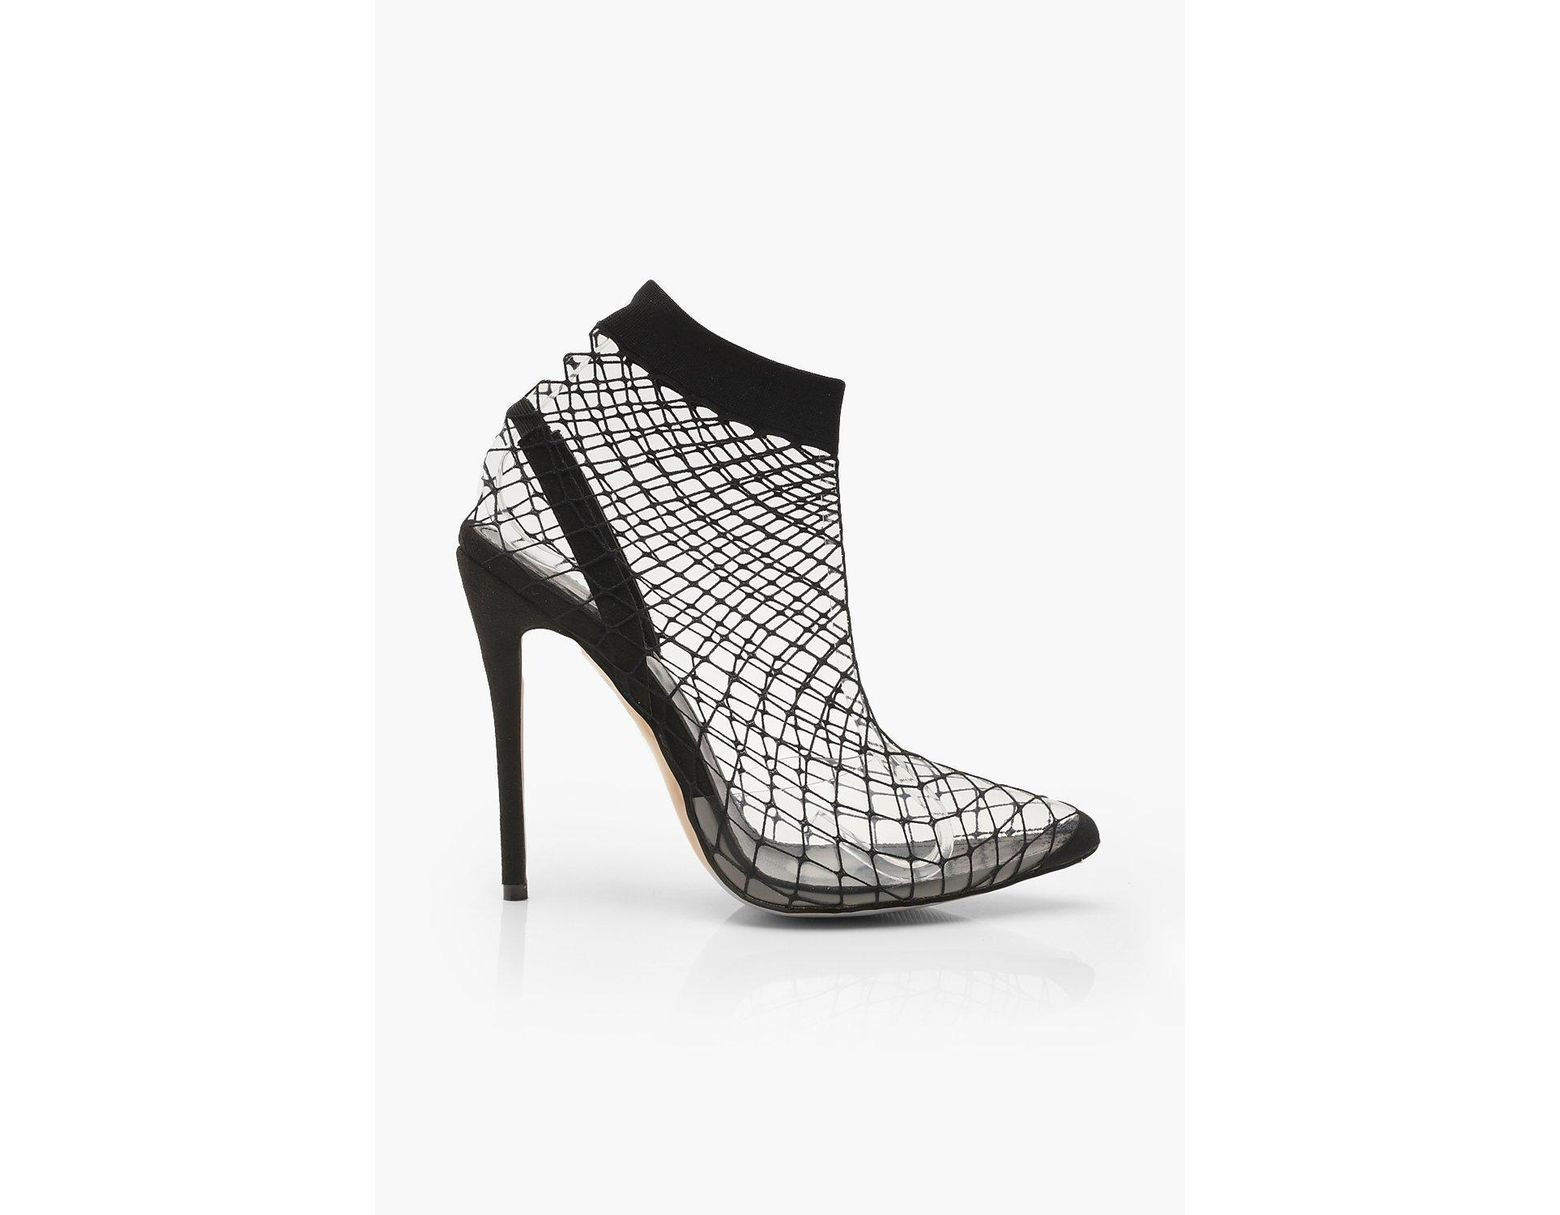 6475828d3c Boohoo Fishnet Slingback Pointed Toe Heels in Black - Lyst